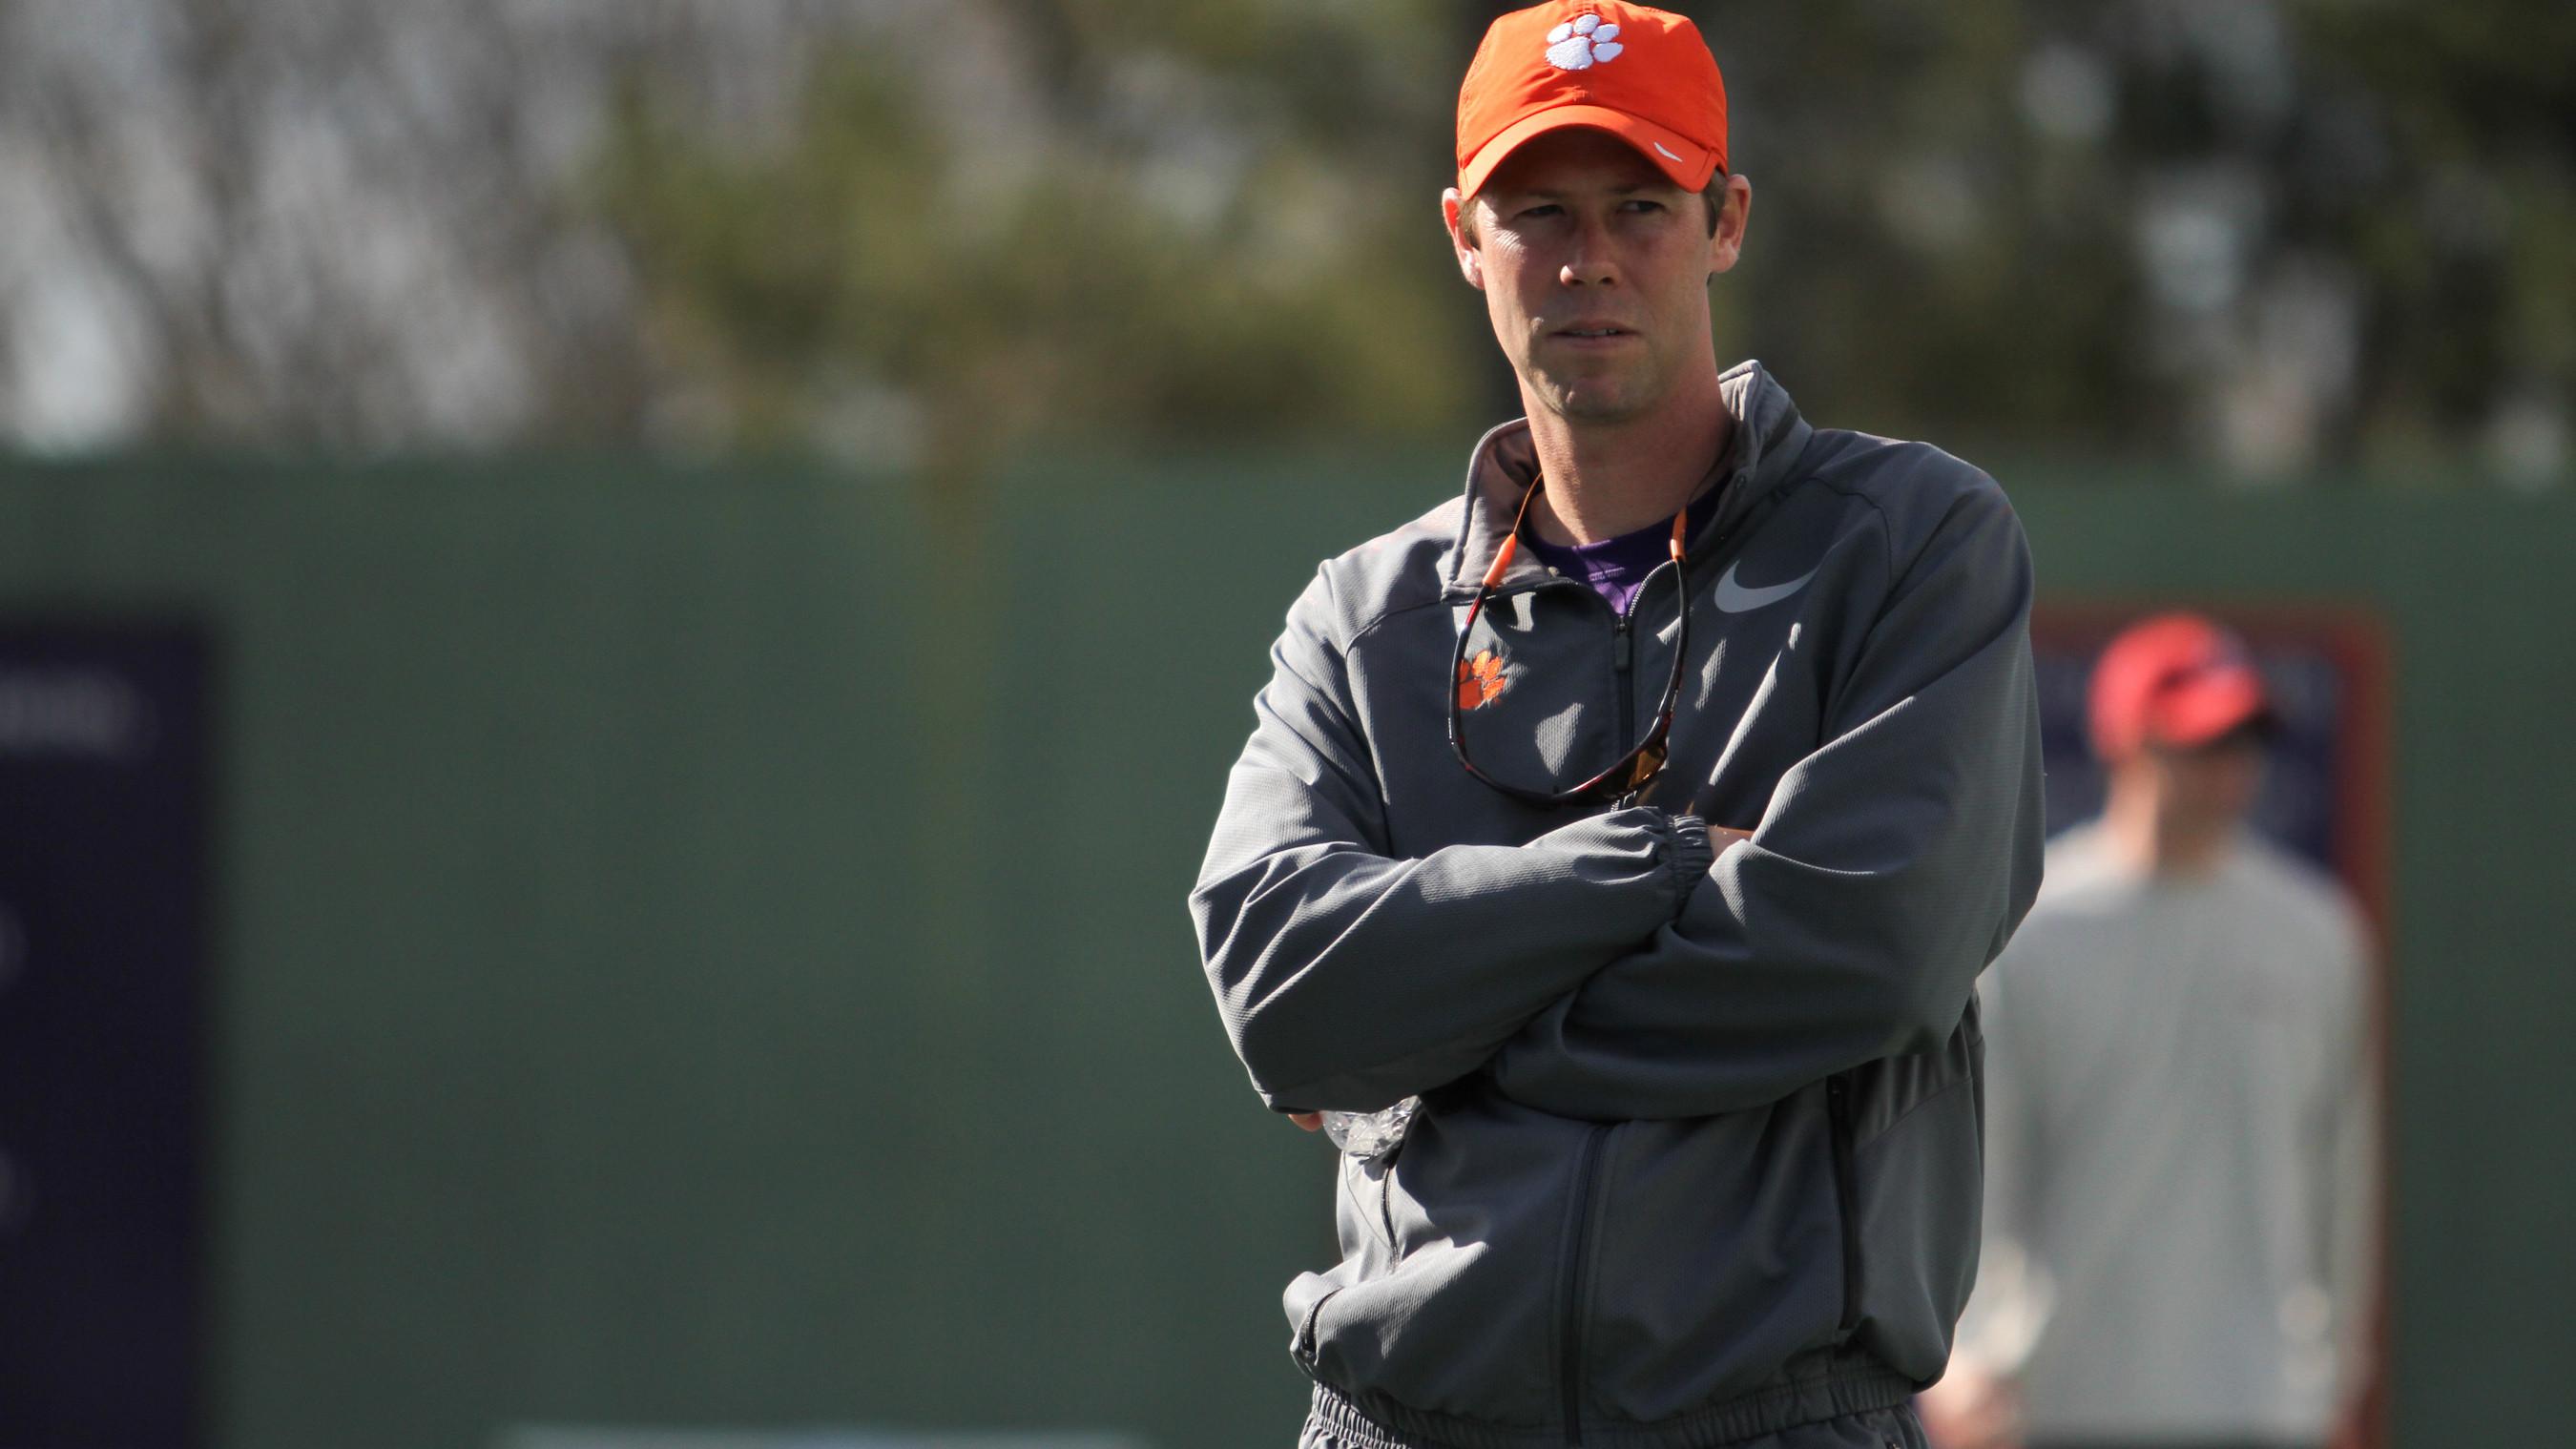 Boetsch Elevated to Associate Head Men's Tennis Coach